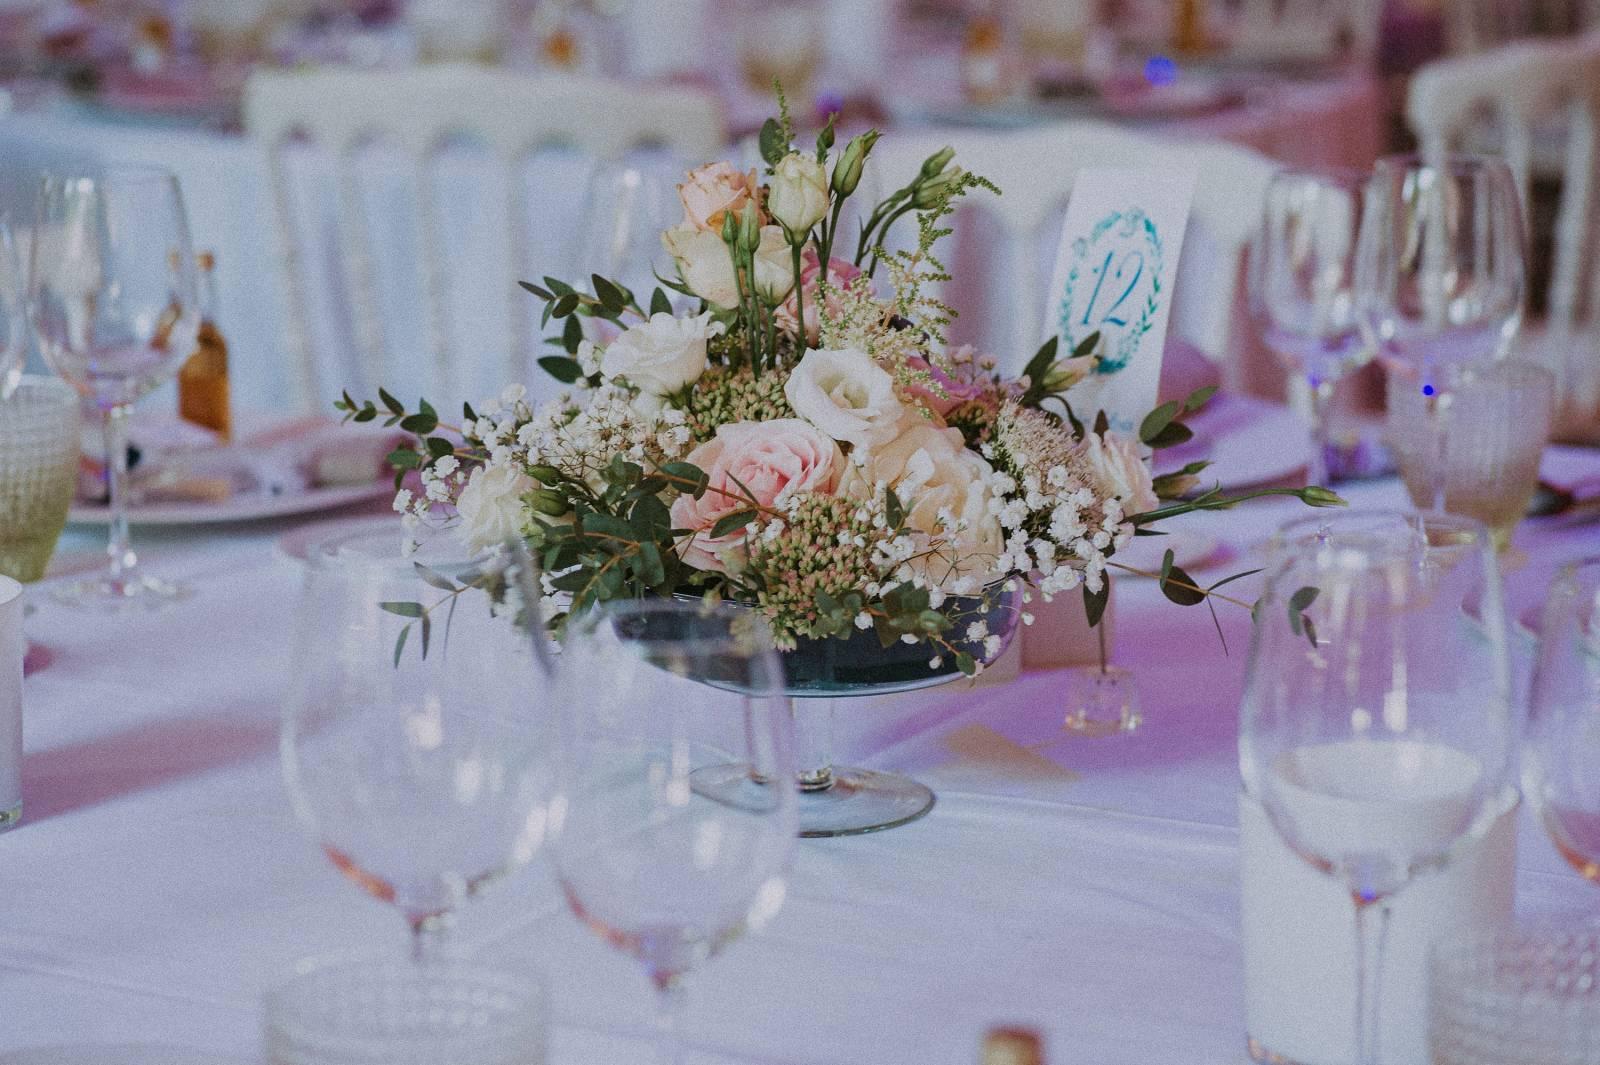 Excellence Weddings - House of Weddings - Aurélien ScArt (15)